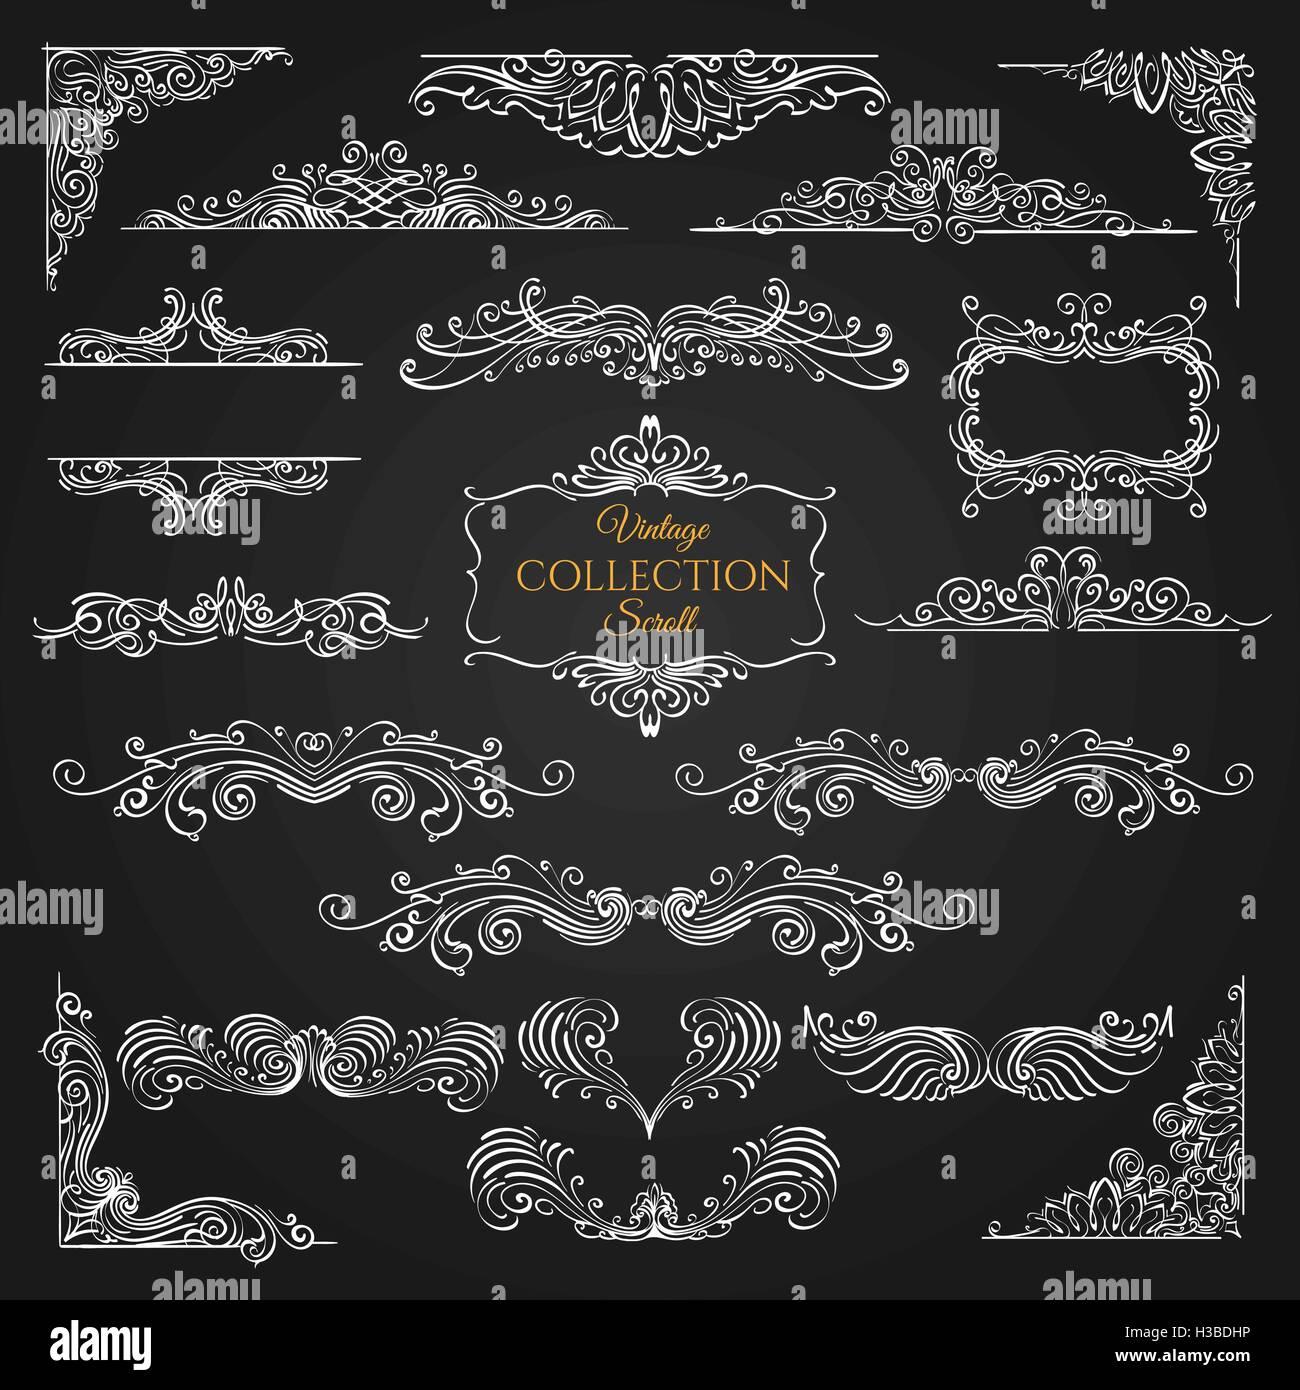 Set of vintage scroll elements on black background. Decorative swirls for your design. Vector illustration. - Stock Image